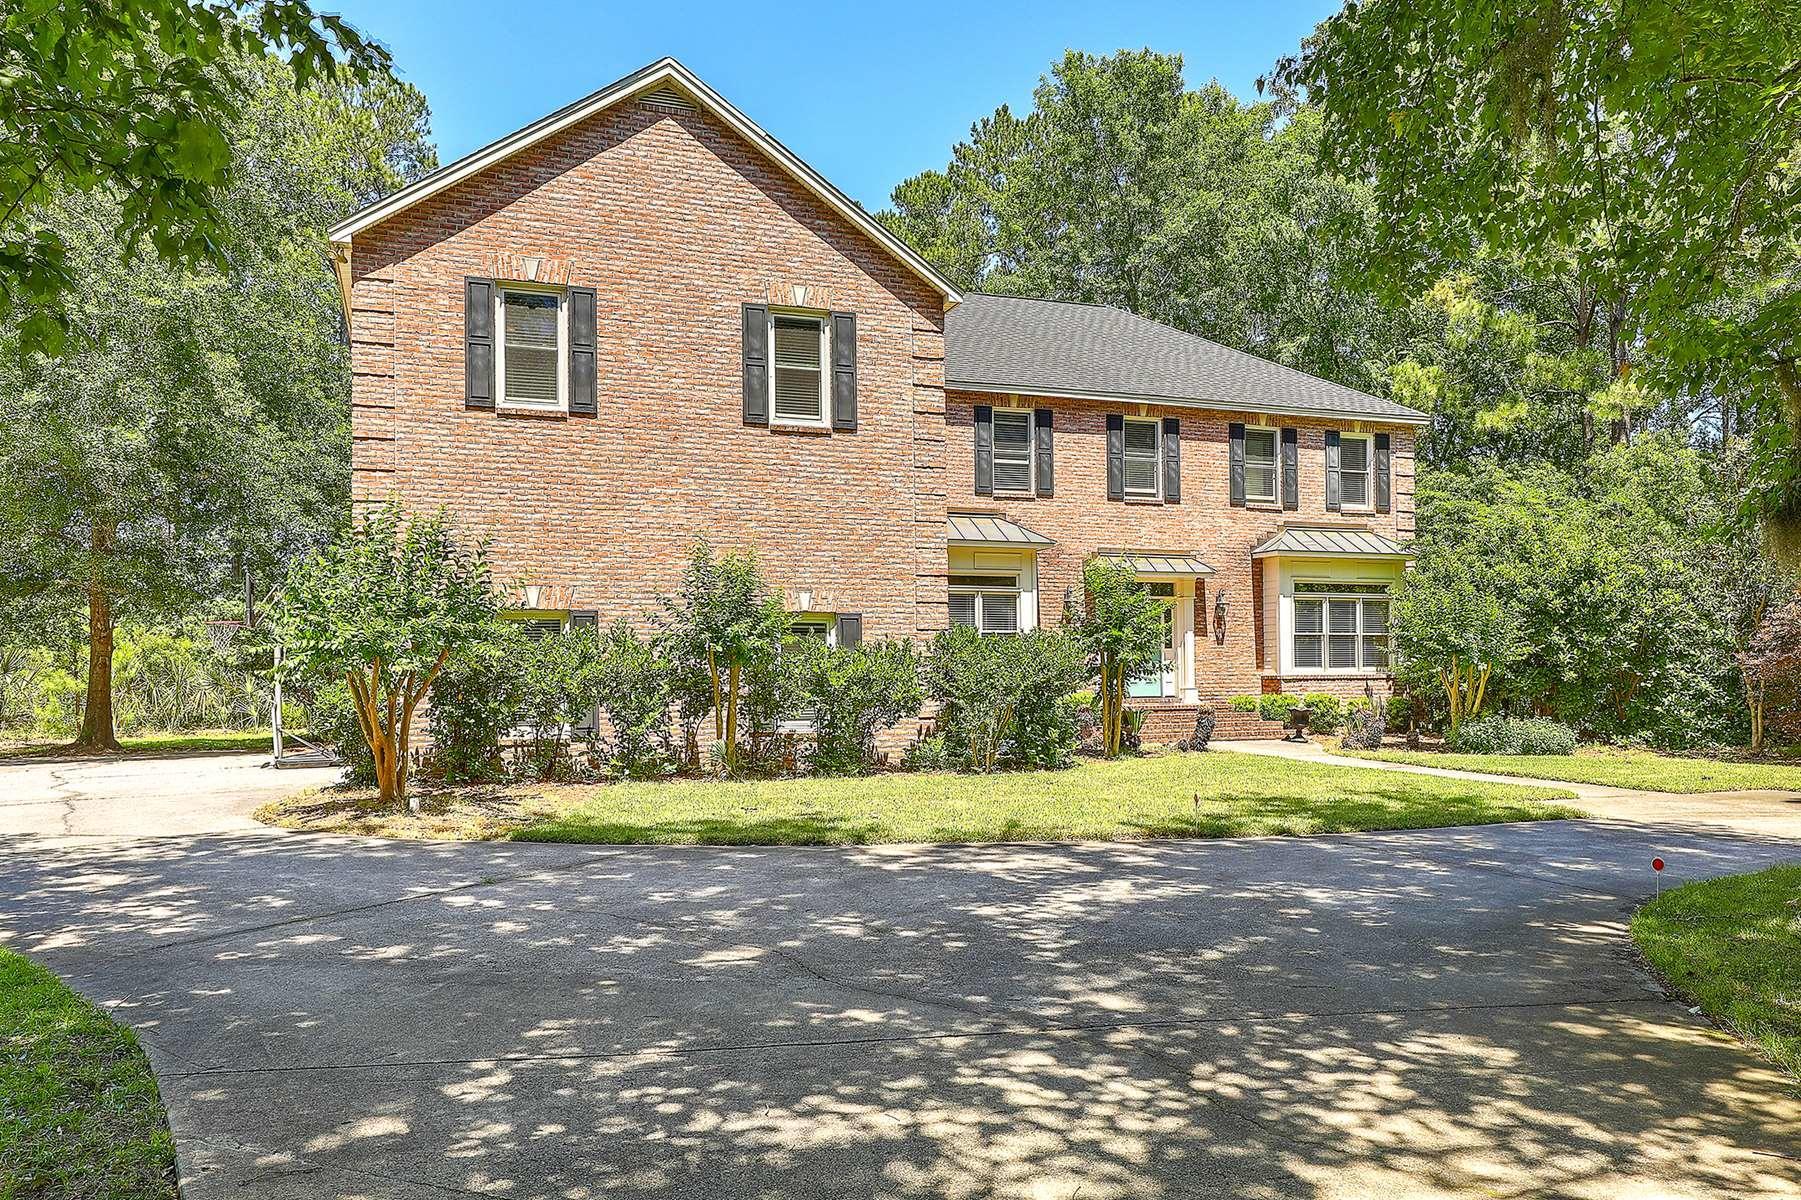 Dunes West Homes For Sale - 2961 Pignatelli, Mount Pleasant, SC - 23